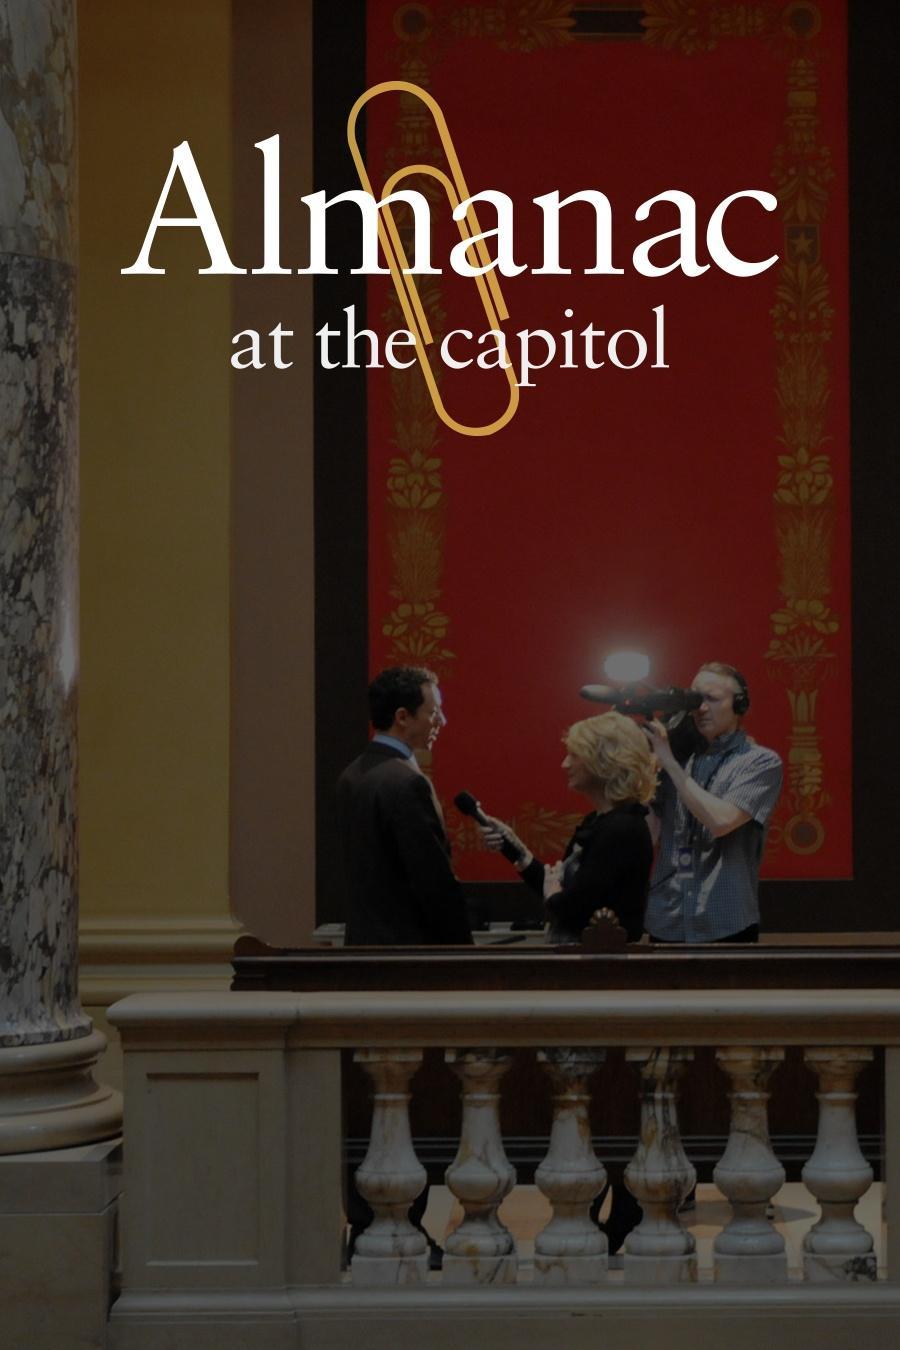 Almanac at the Capitol